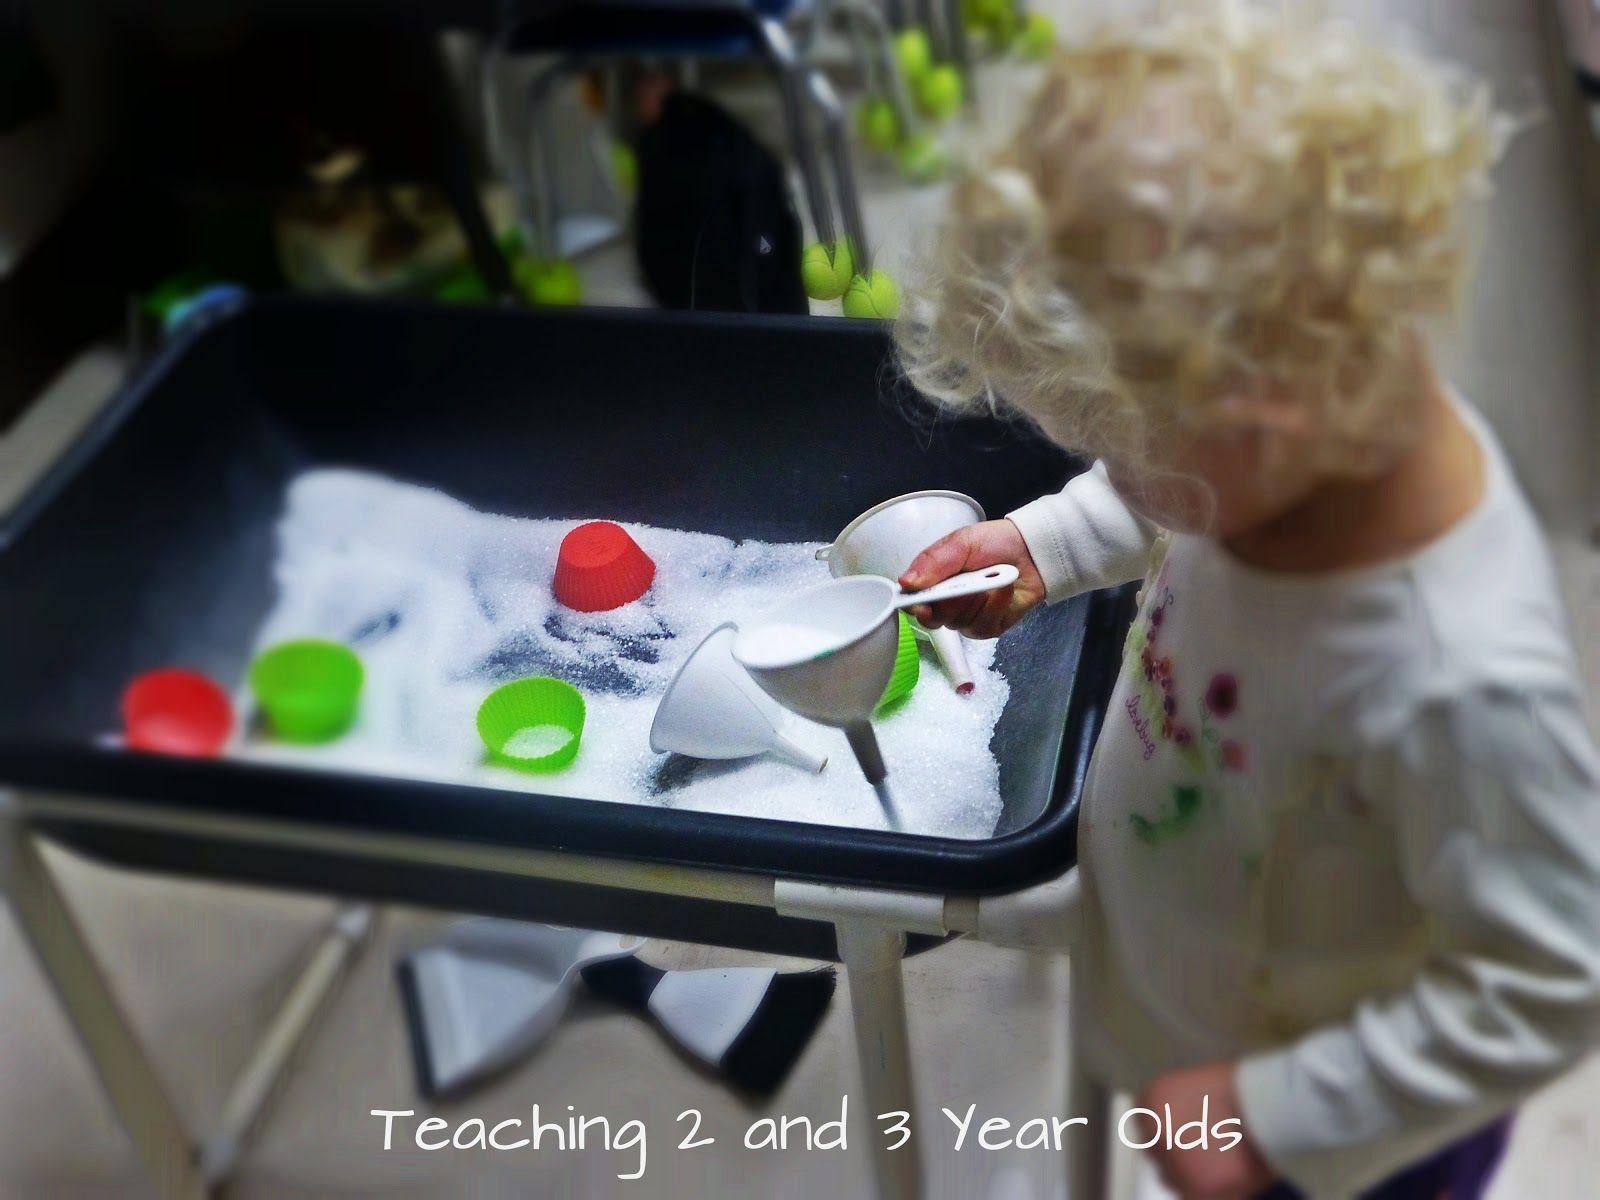 Teaching 2 and 3 Year Olds: Epsom Salt Sensory Table